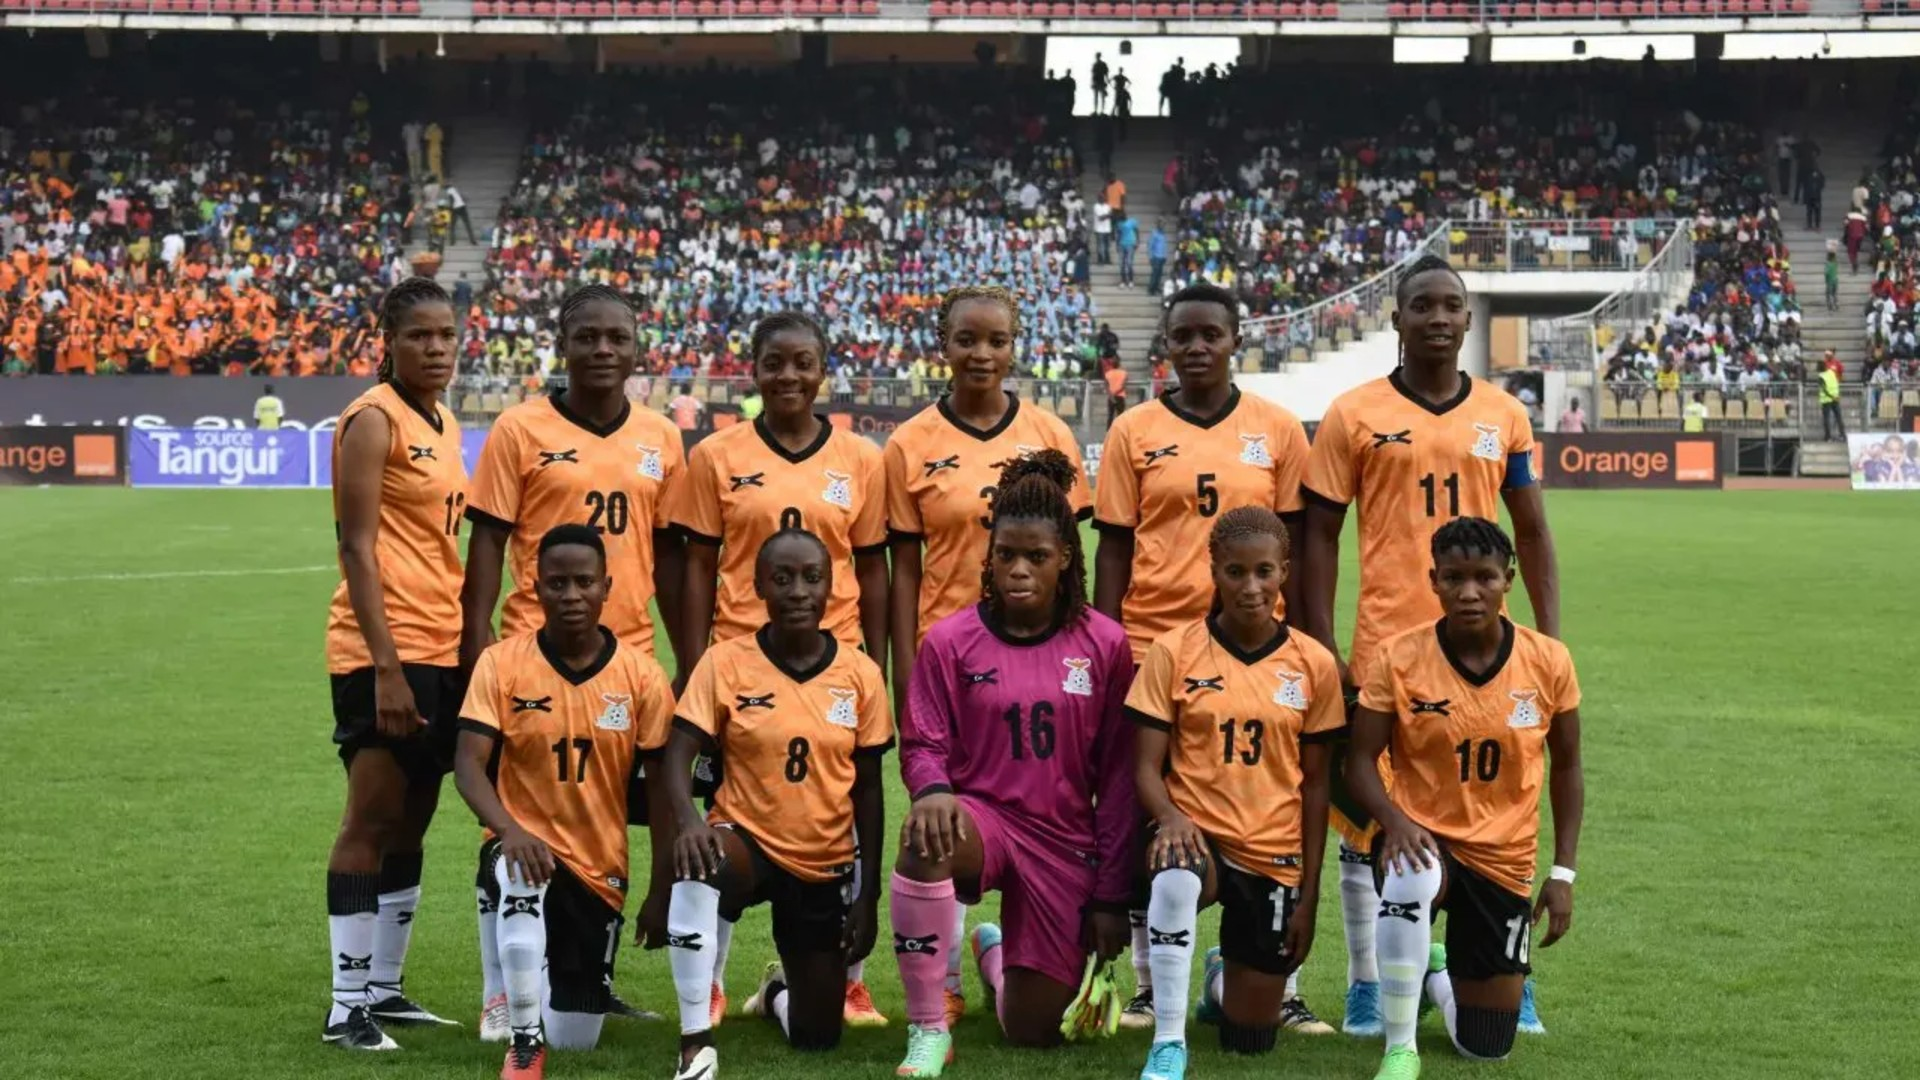 Banda, Chanda and Mubanga headline Zambia squad for Tokyo Olympics - Sport News Africa